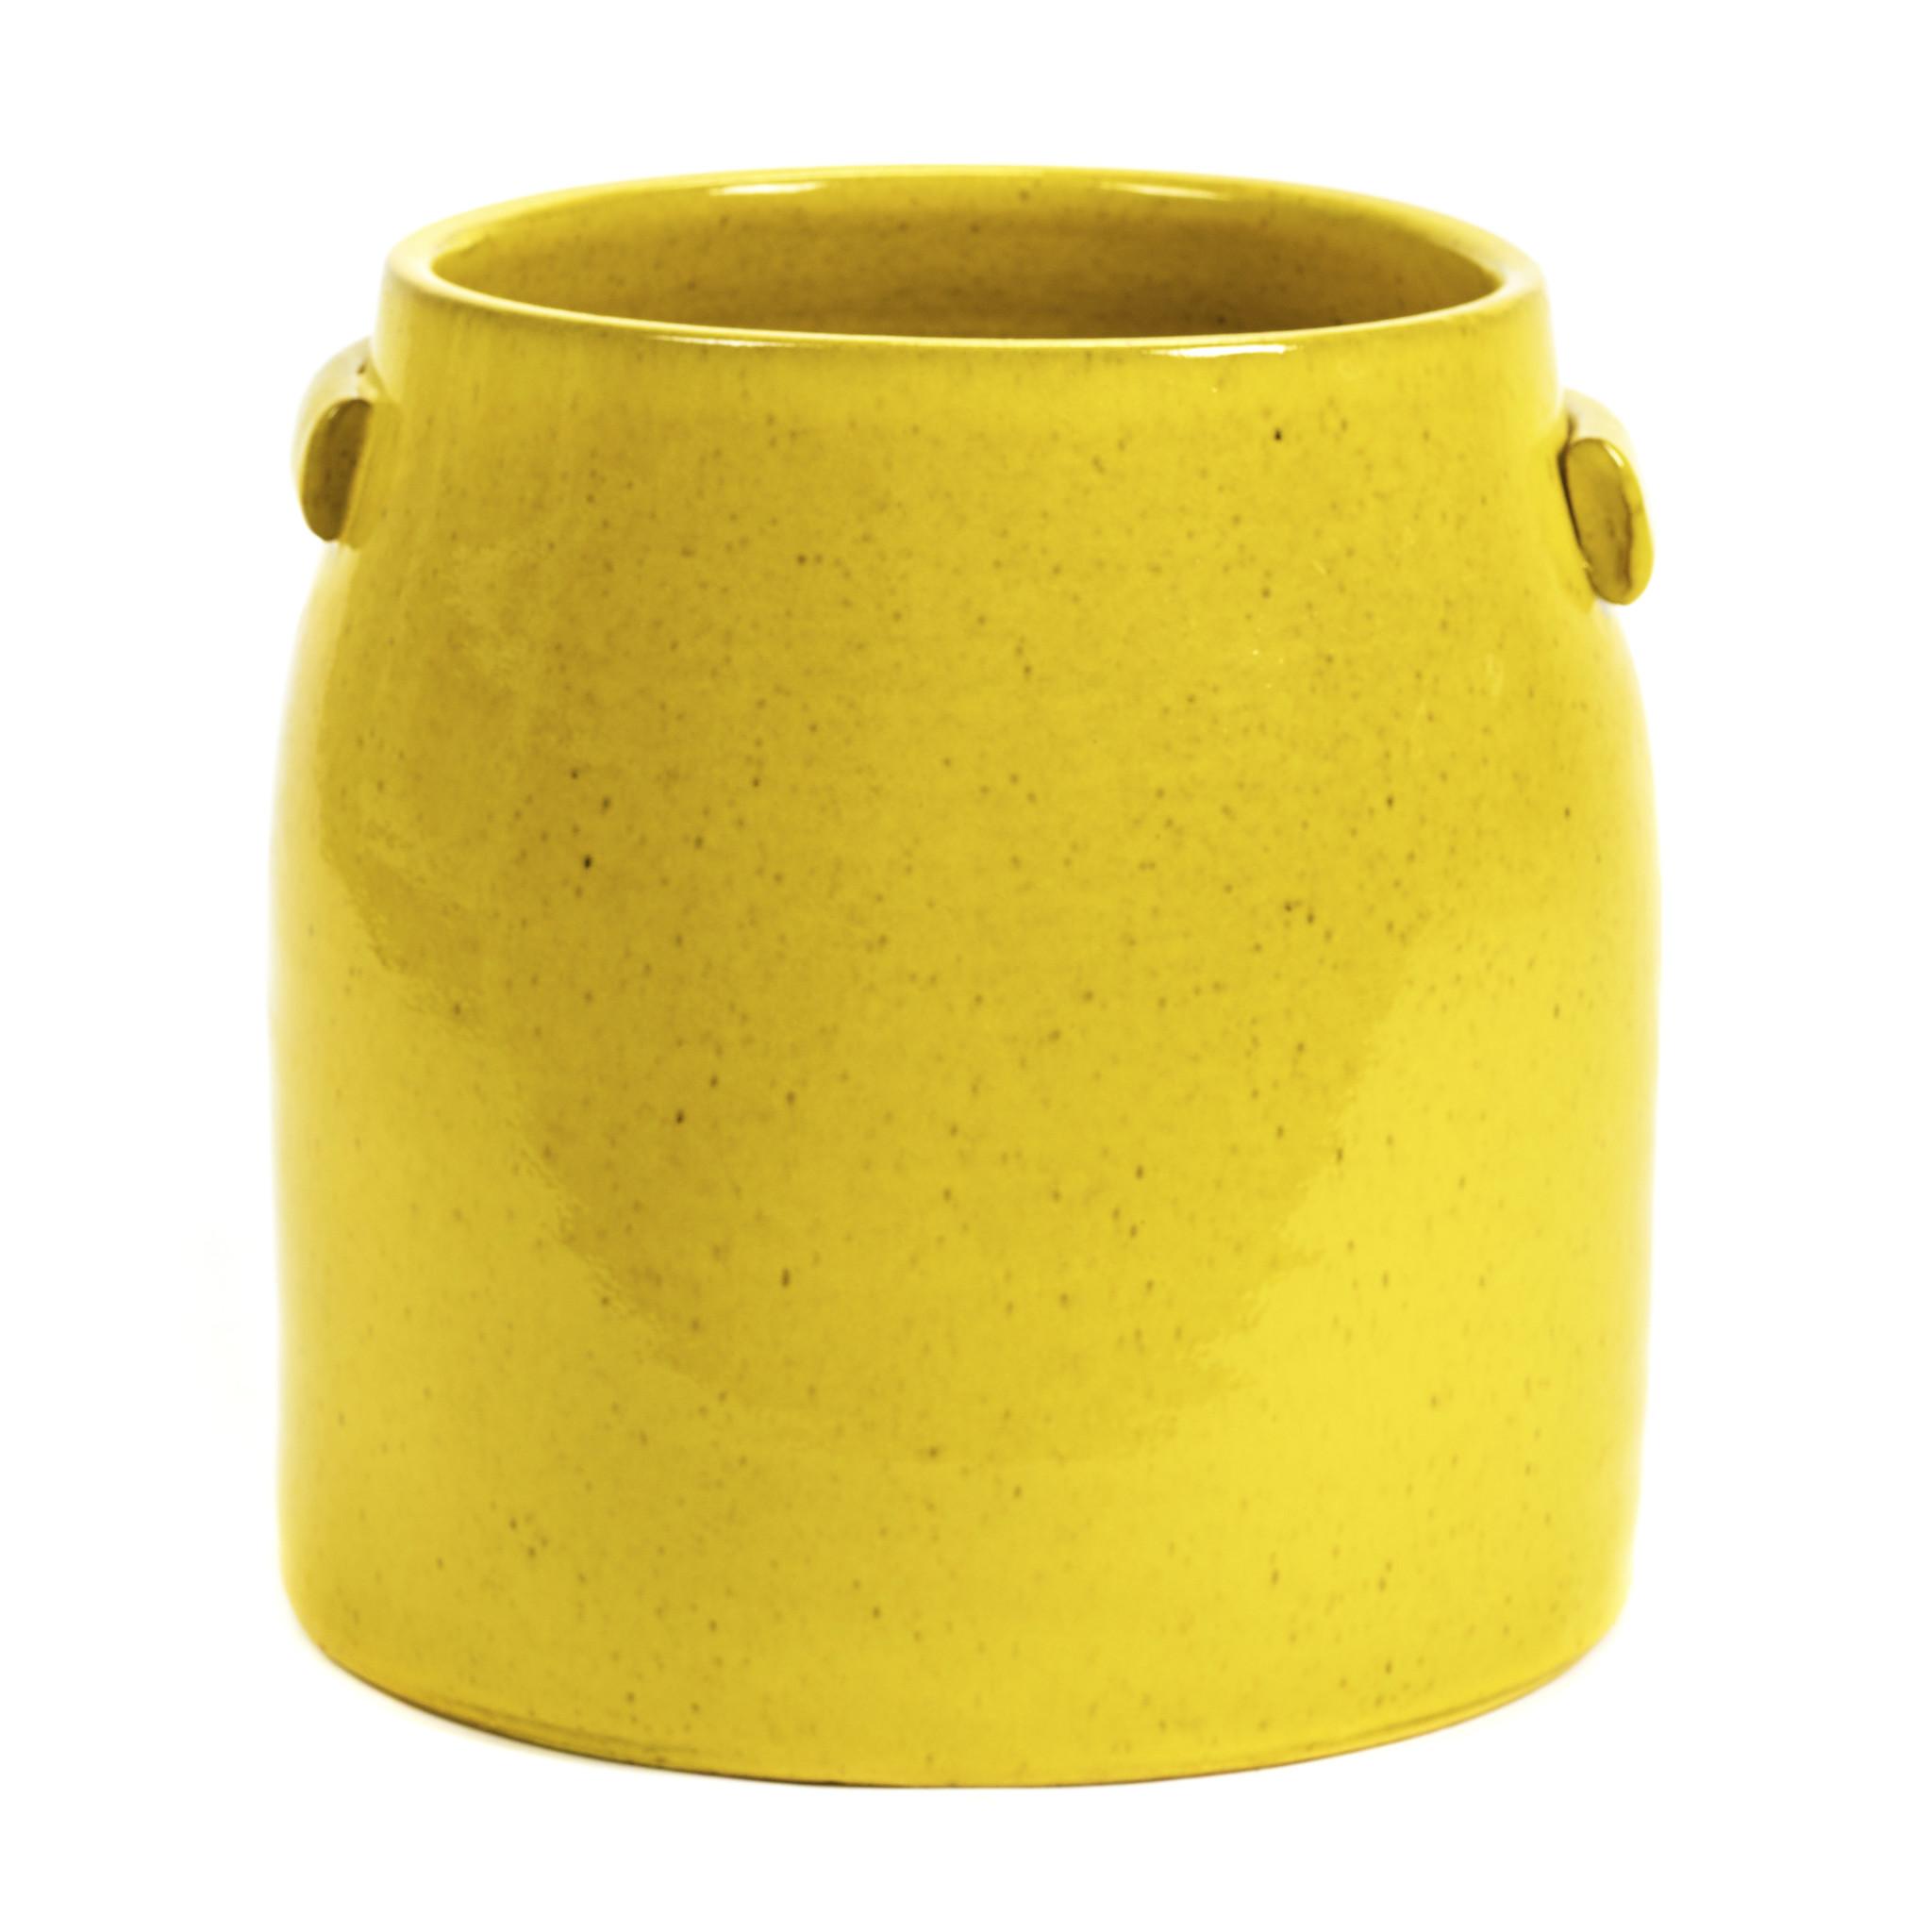 Gele bloempot van keramiek